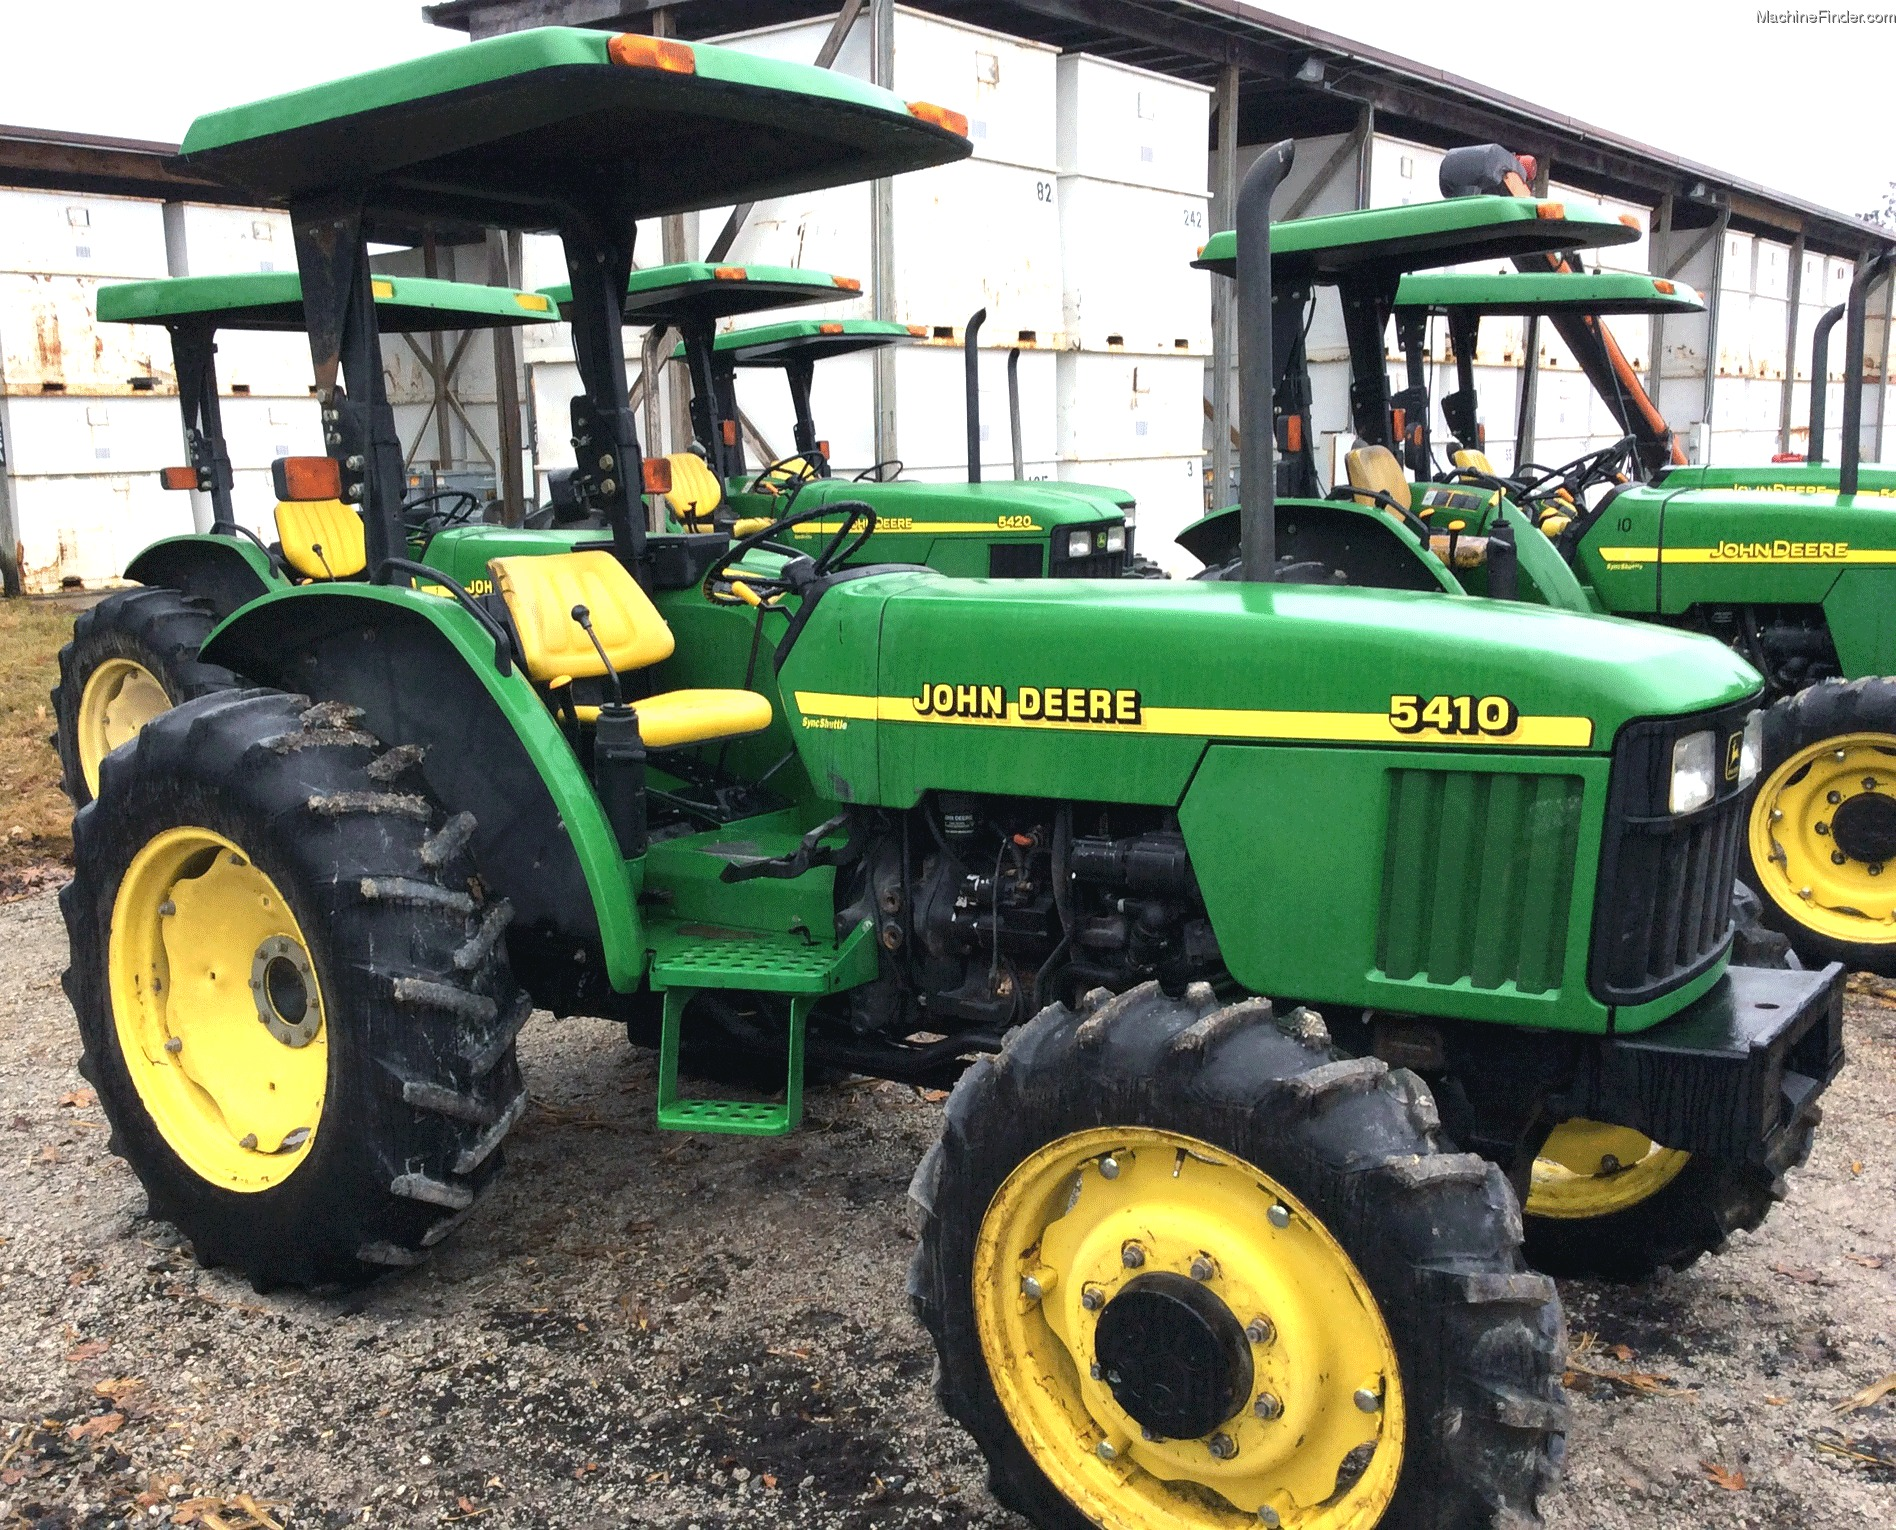 1999 John Deere 5410 Tractors - Utility (40-100hp) - John ...